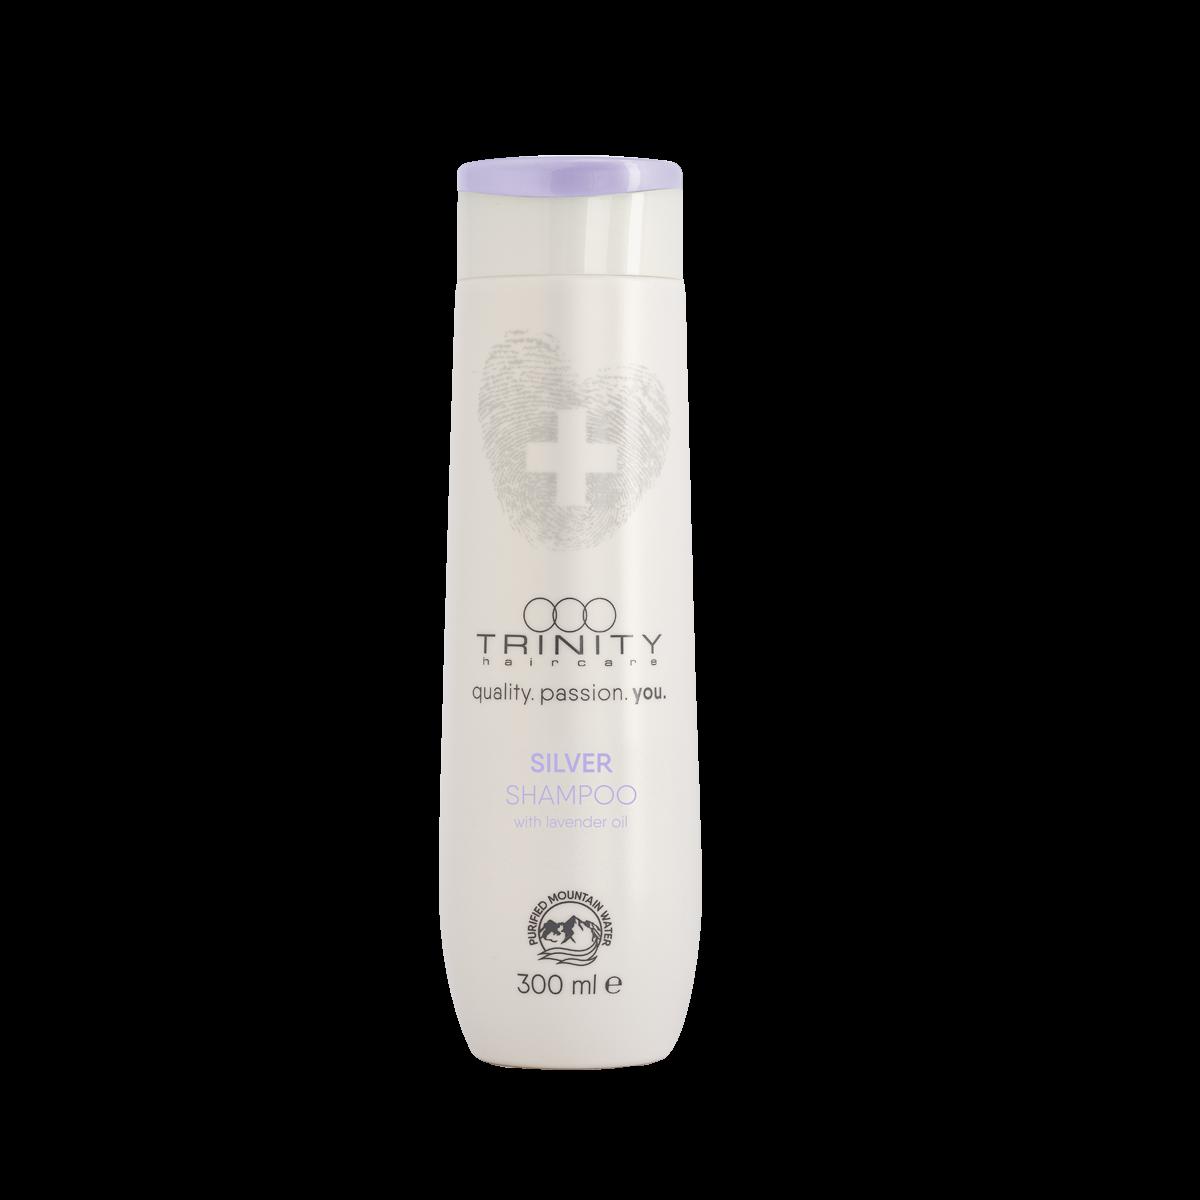 Trinity Hair Care Шампунь Essentials Silver Reflex Shampoo Оттеночный Серебряный, 300 мл